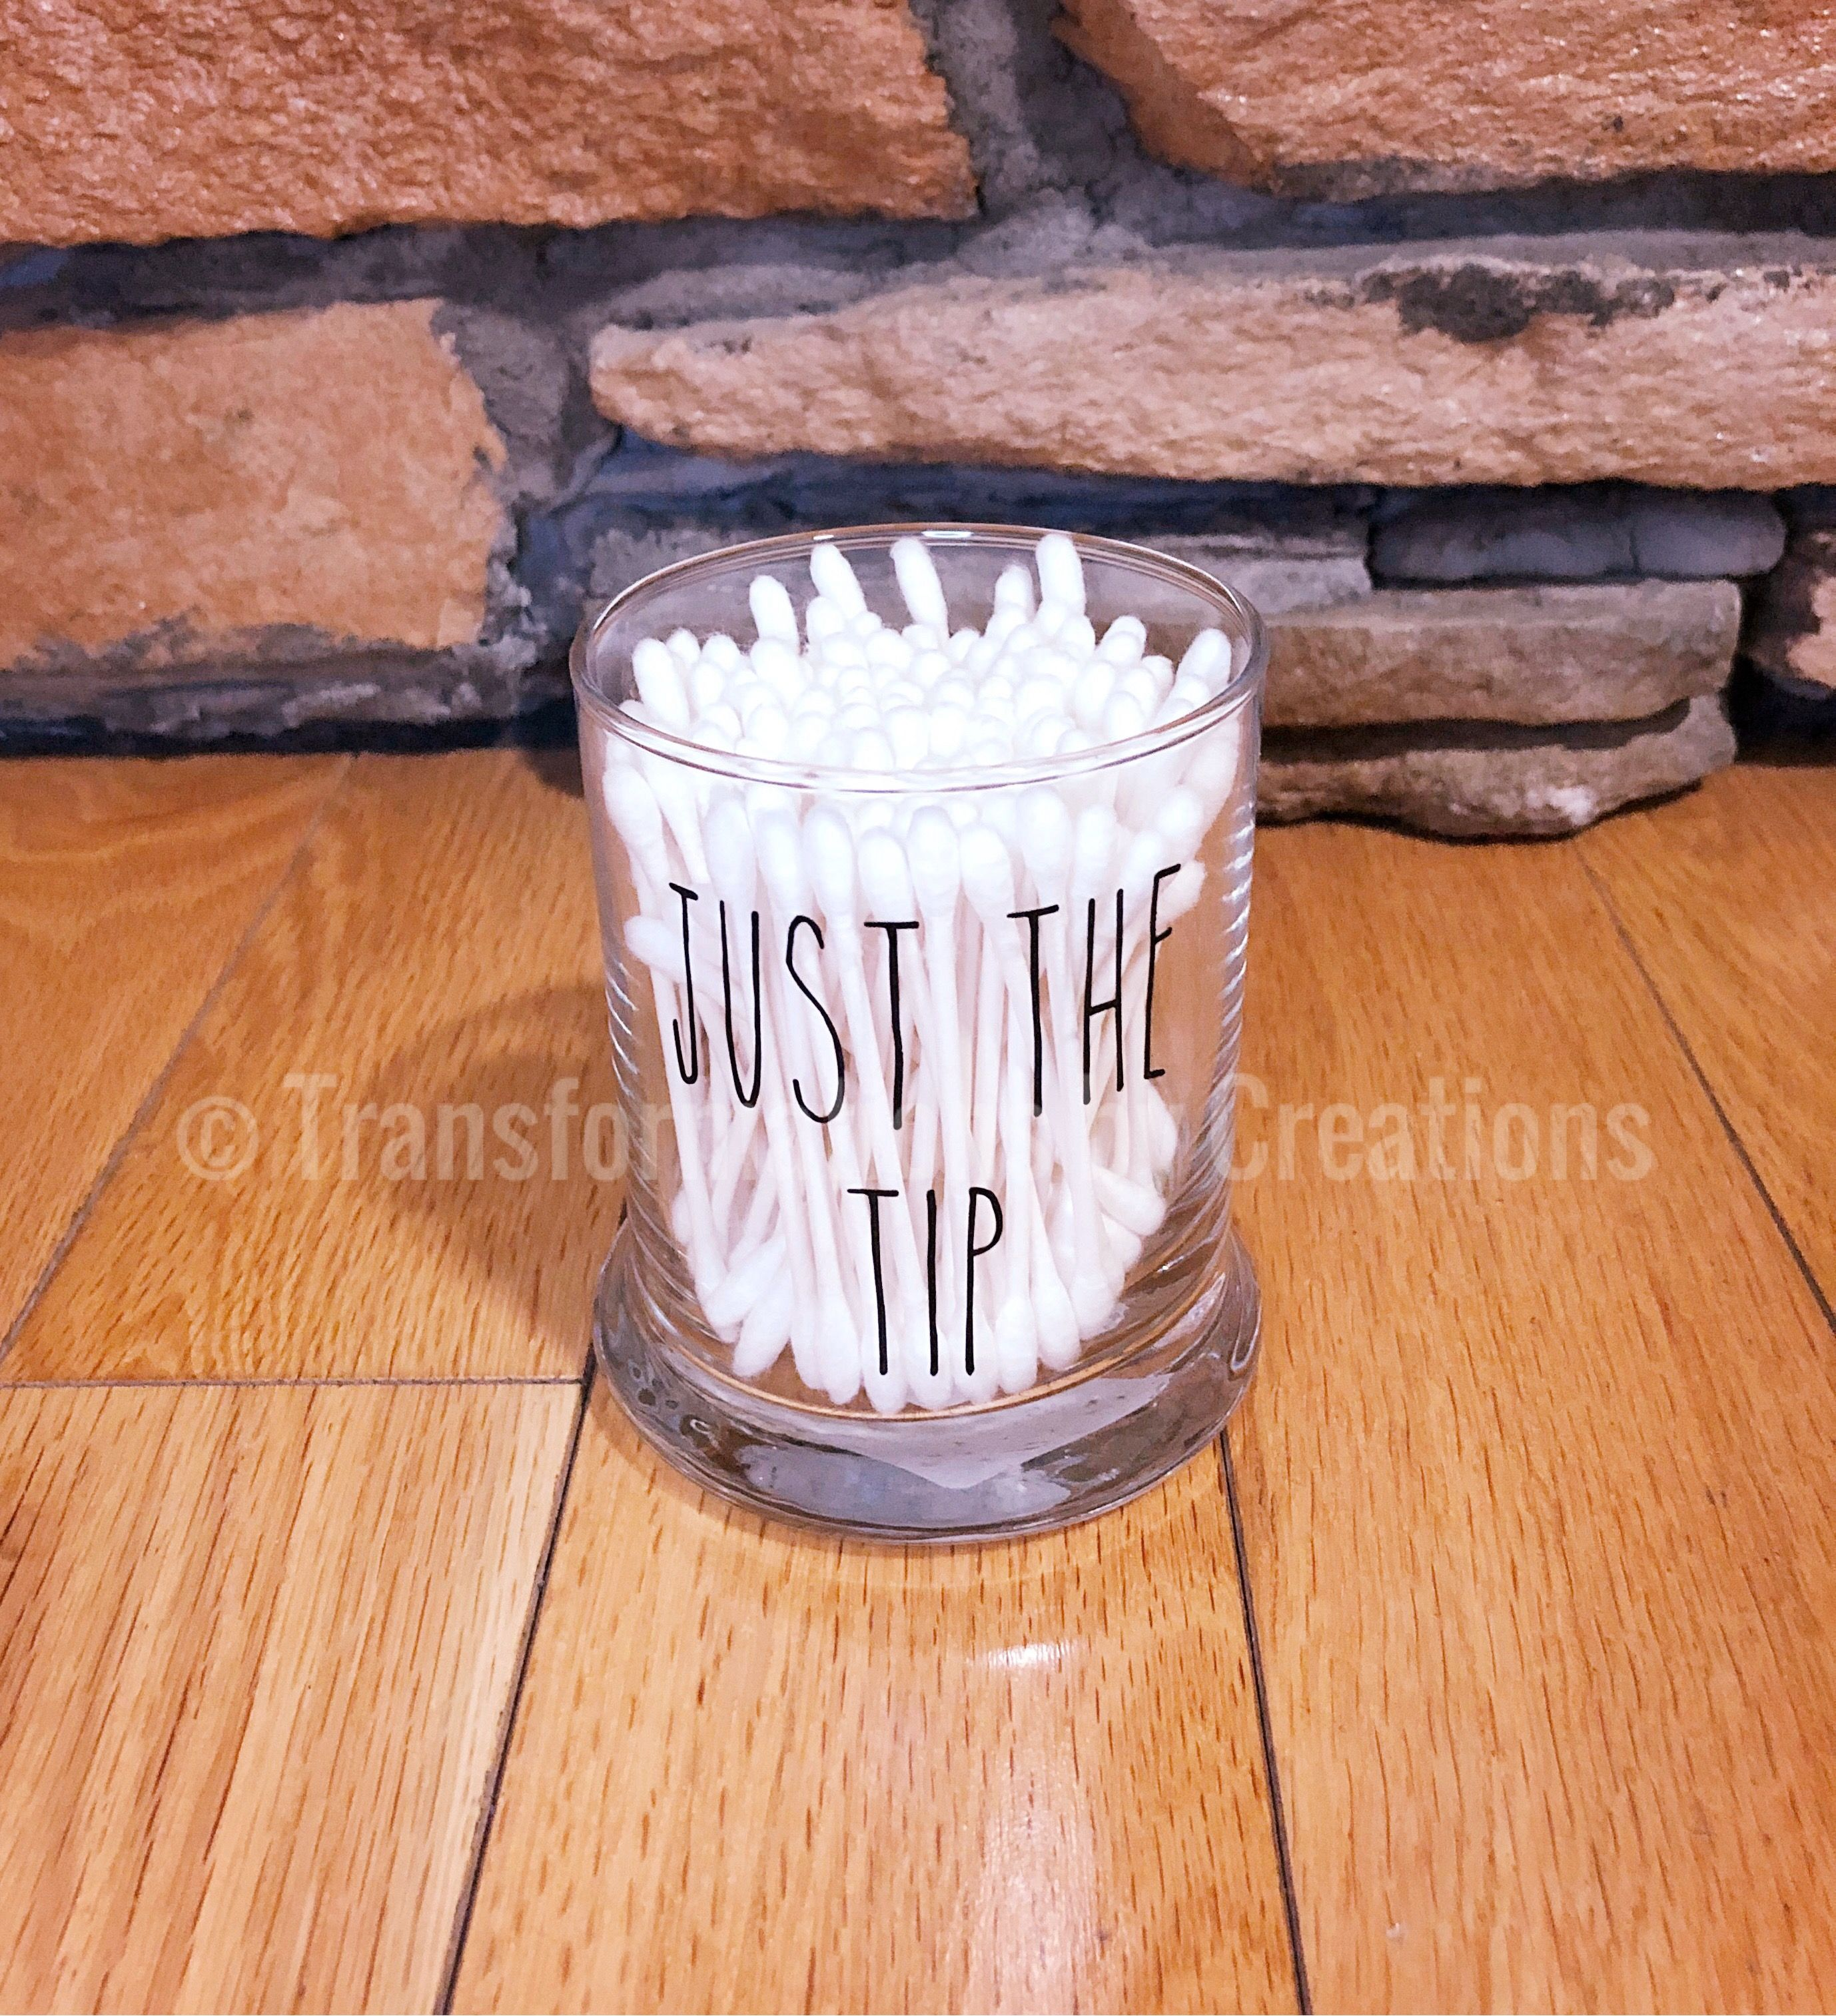 Just The Tip Q Tip Holder Bathroom Decor Funny Bathroom Storage Jars Q Tip Holder Jar Storage Cotton Ball Holder Bathroom q tip holder